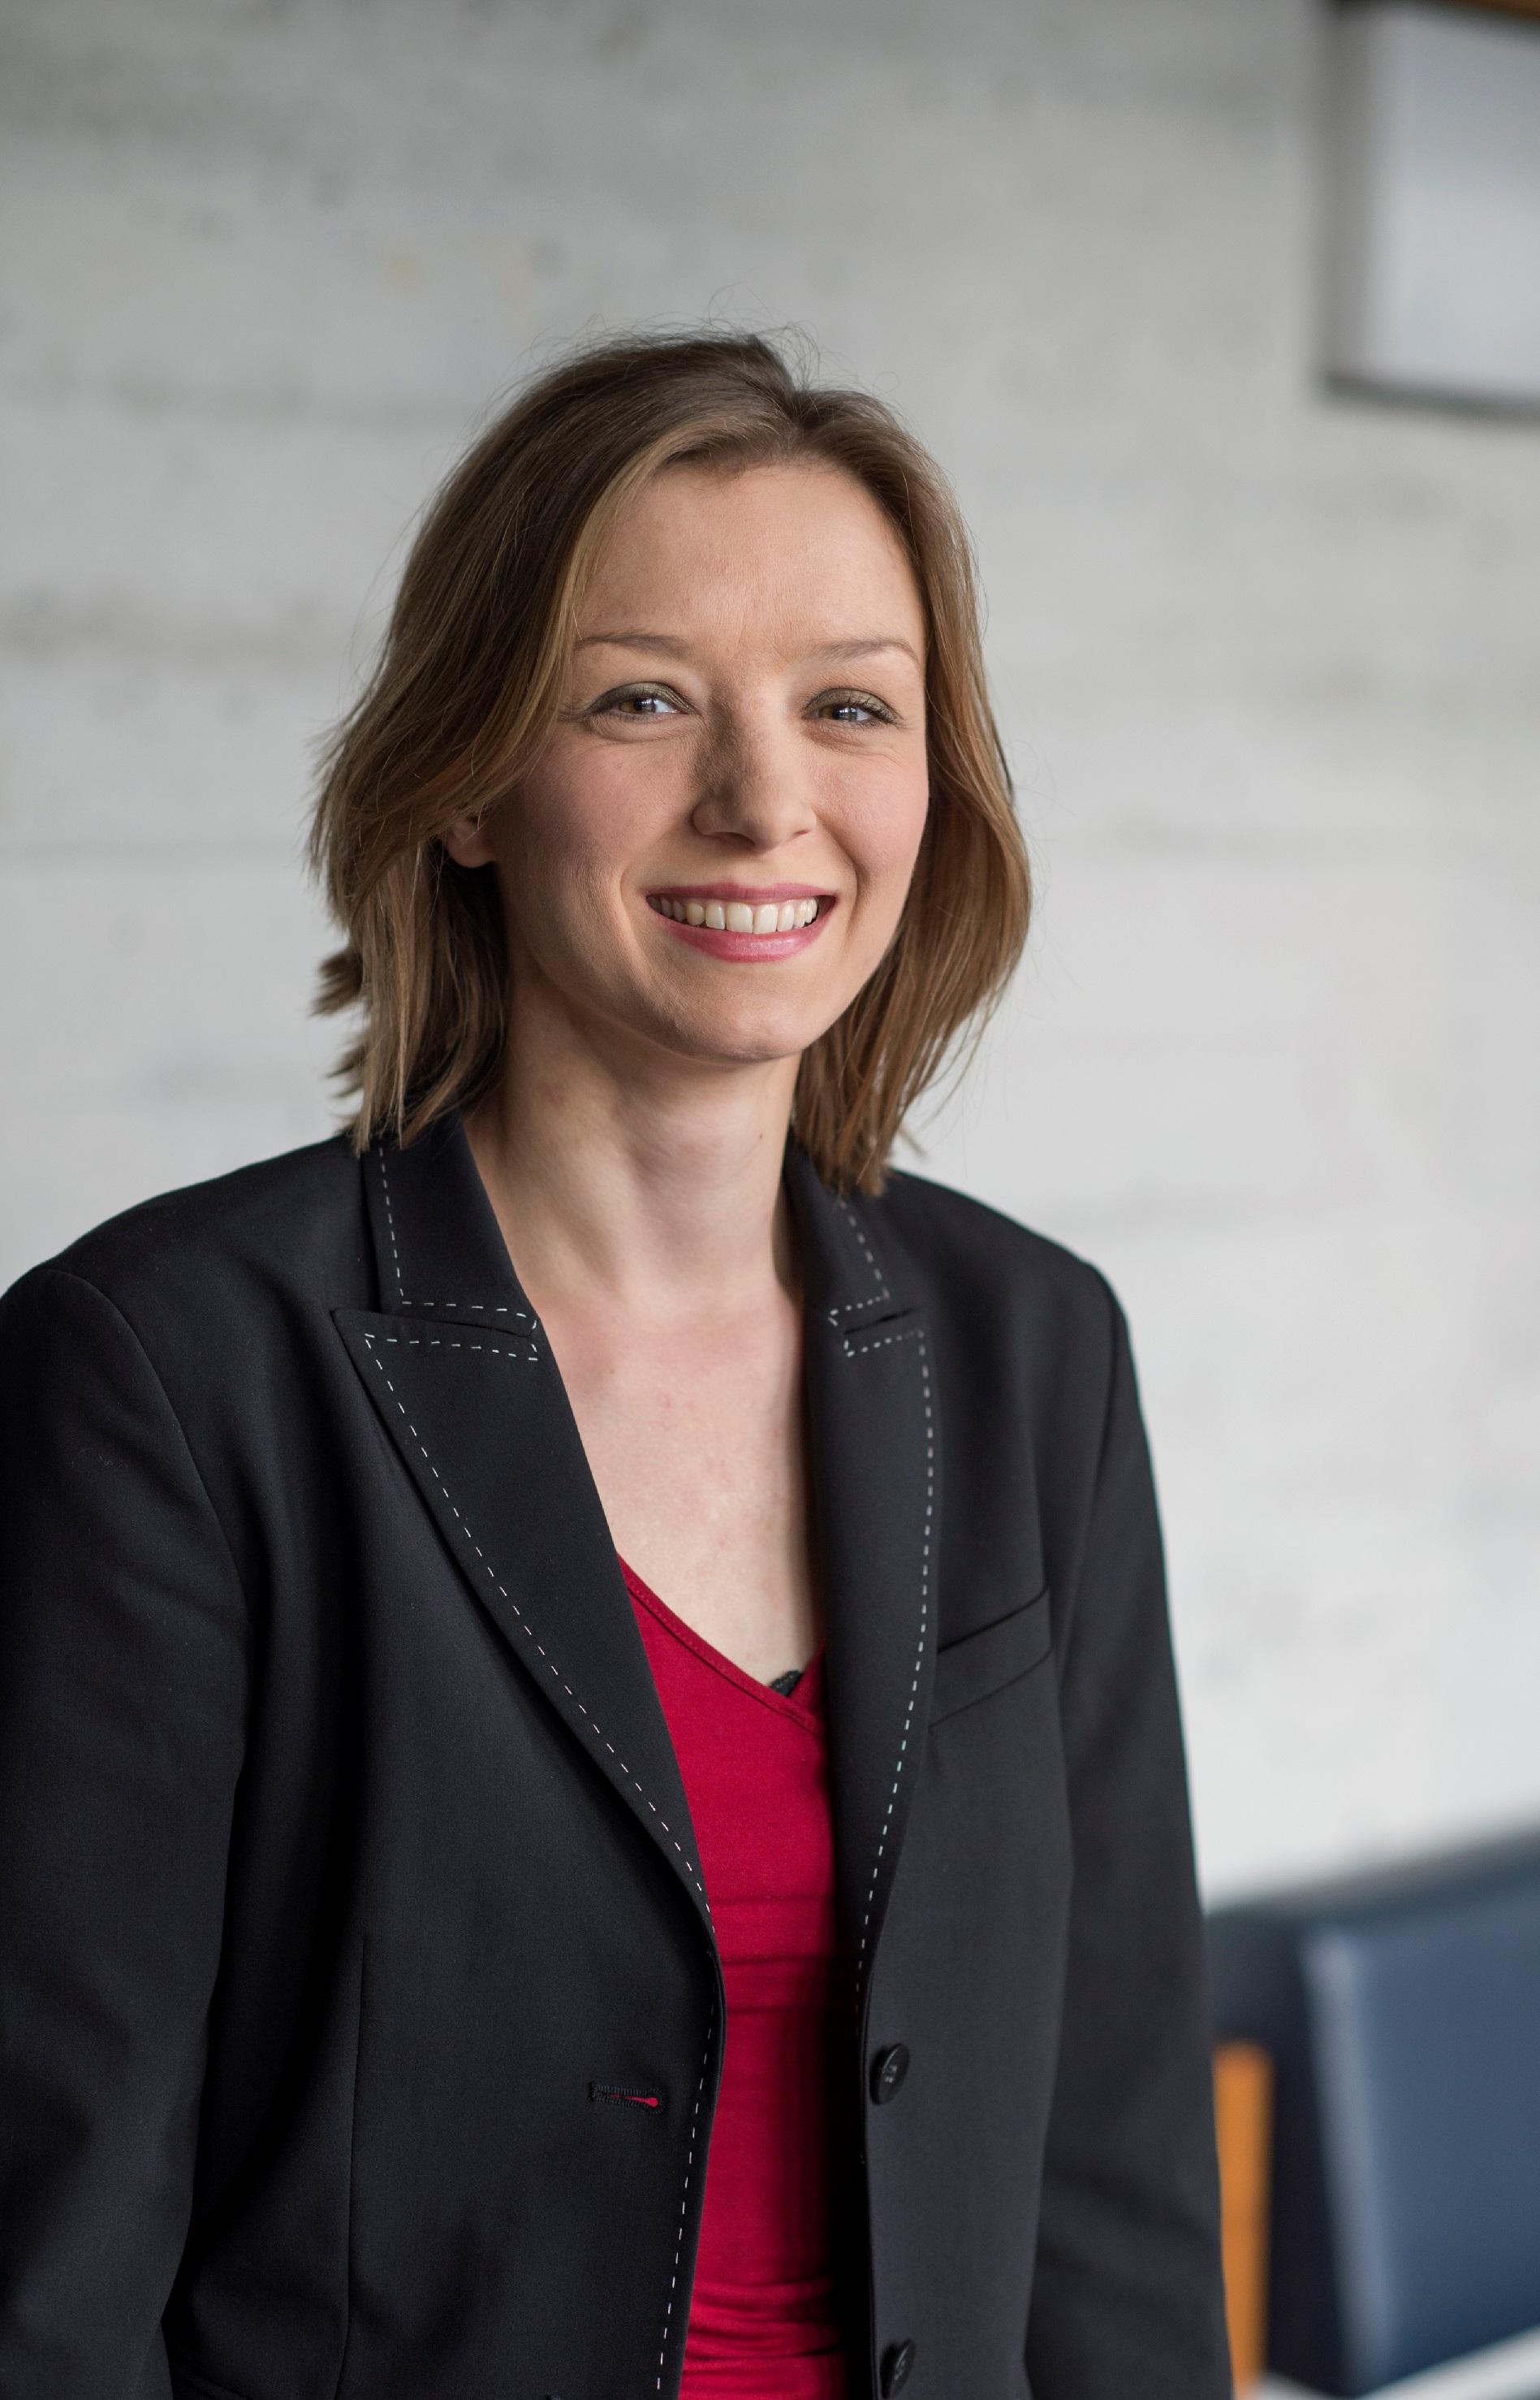 Lisa Herzog (Germany & New College 2007)